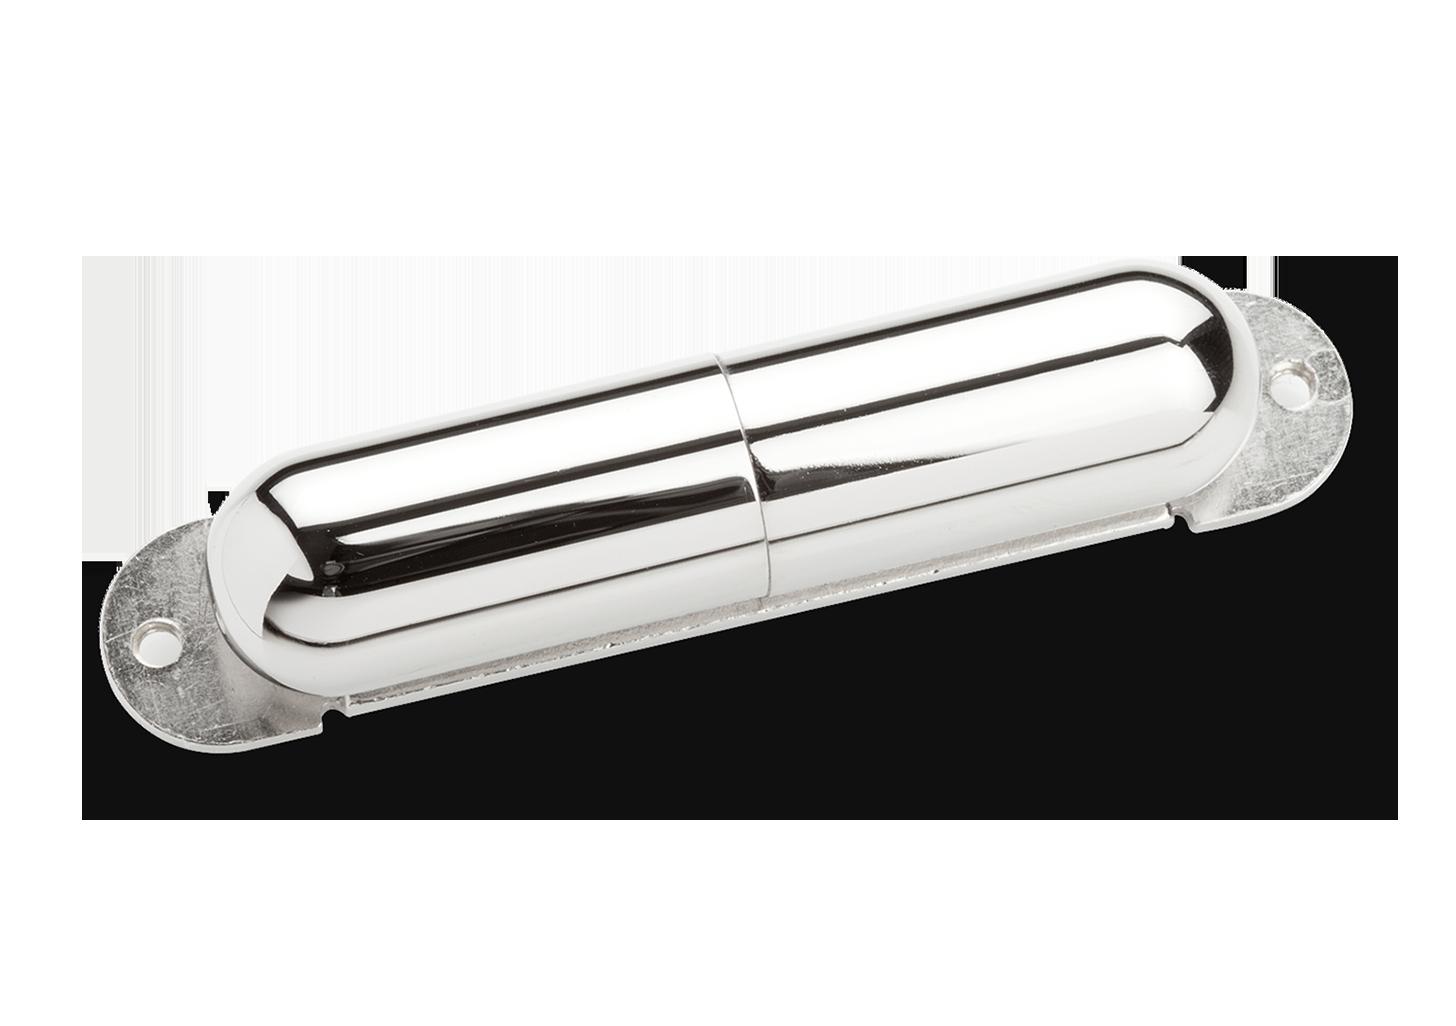 Seymour Duncan Lipstick Tube Strat SLS-1B Bridge